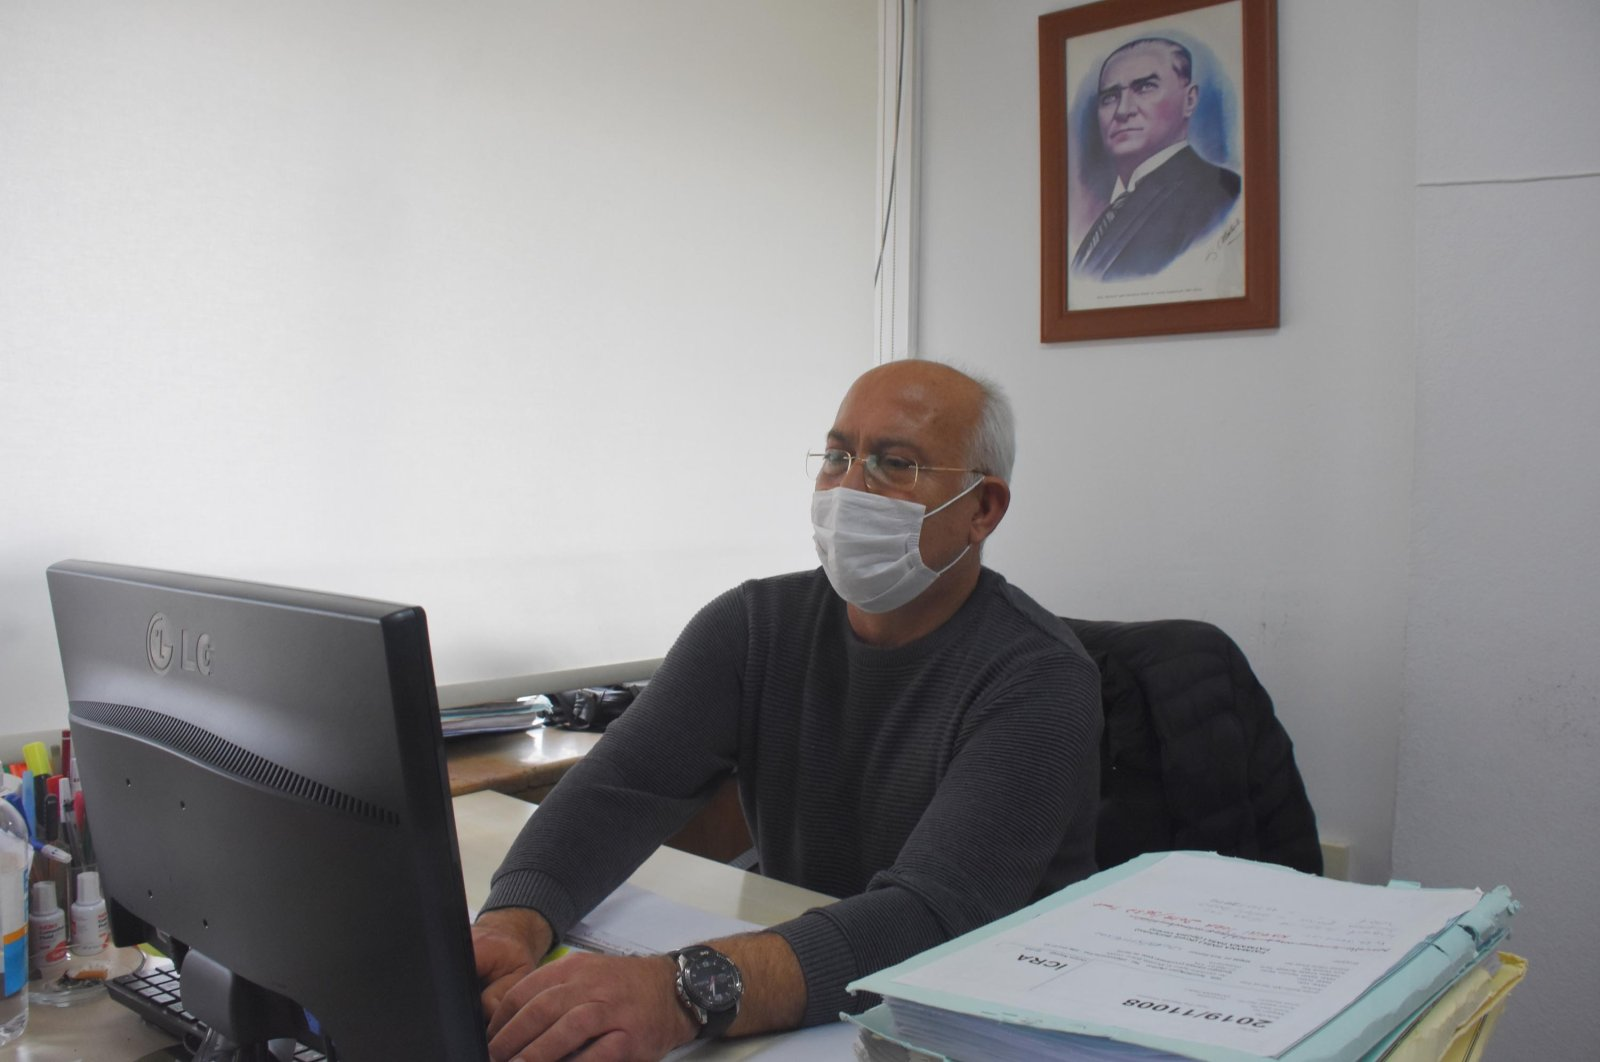 Atılay Özün works in his office, Konak district, Izmir, Turkey, Nov. 5, 2020. (DHA Photo)